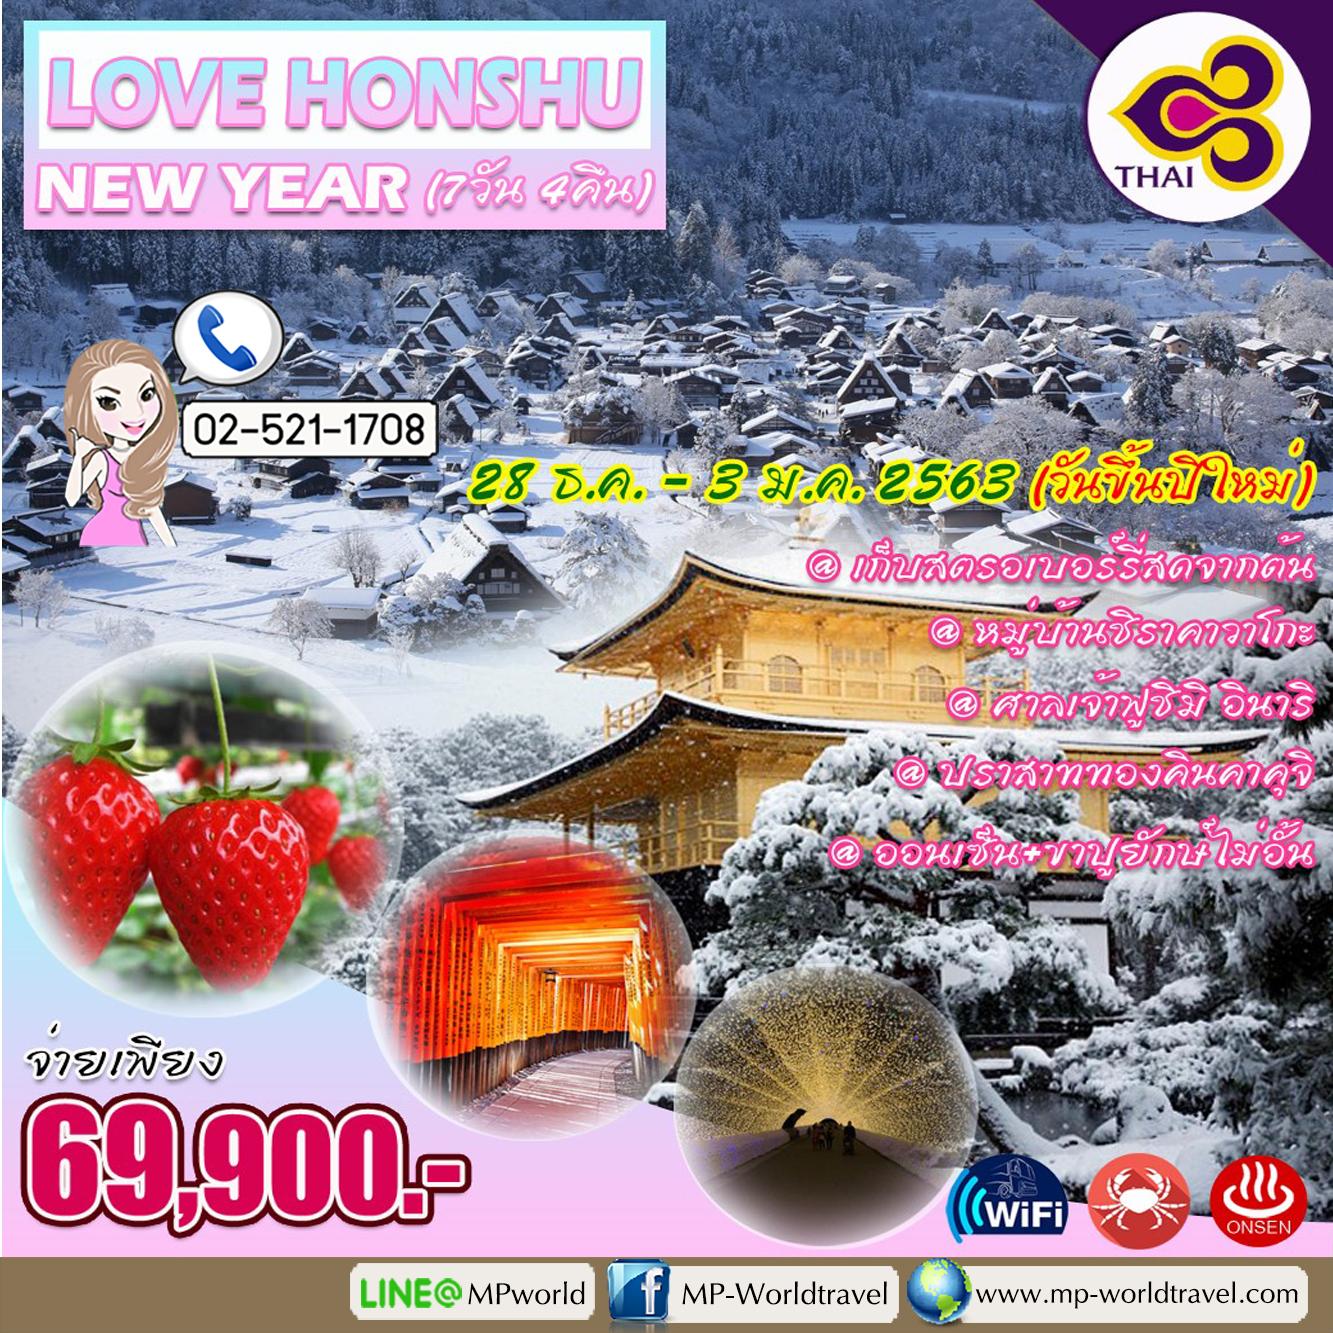 LOVE HONSHU NEW YEAR 7D 4N TG